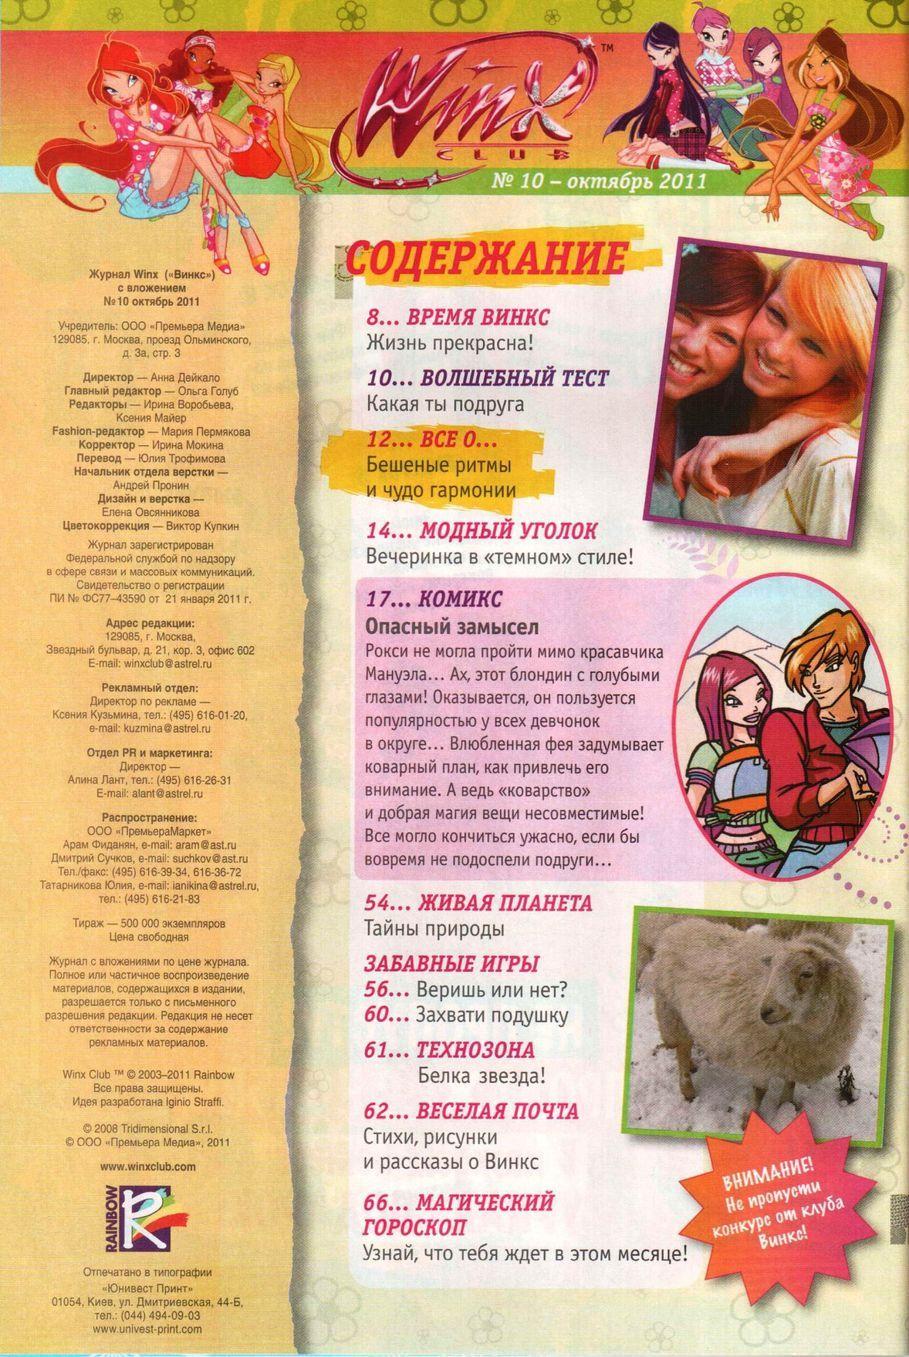 Комикс Винкс Winx - Опасный замысел (Журнал Винкс №10 2011) - стр. 3